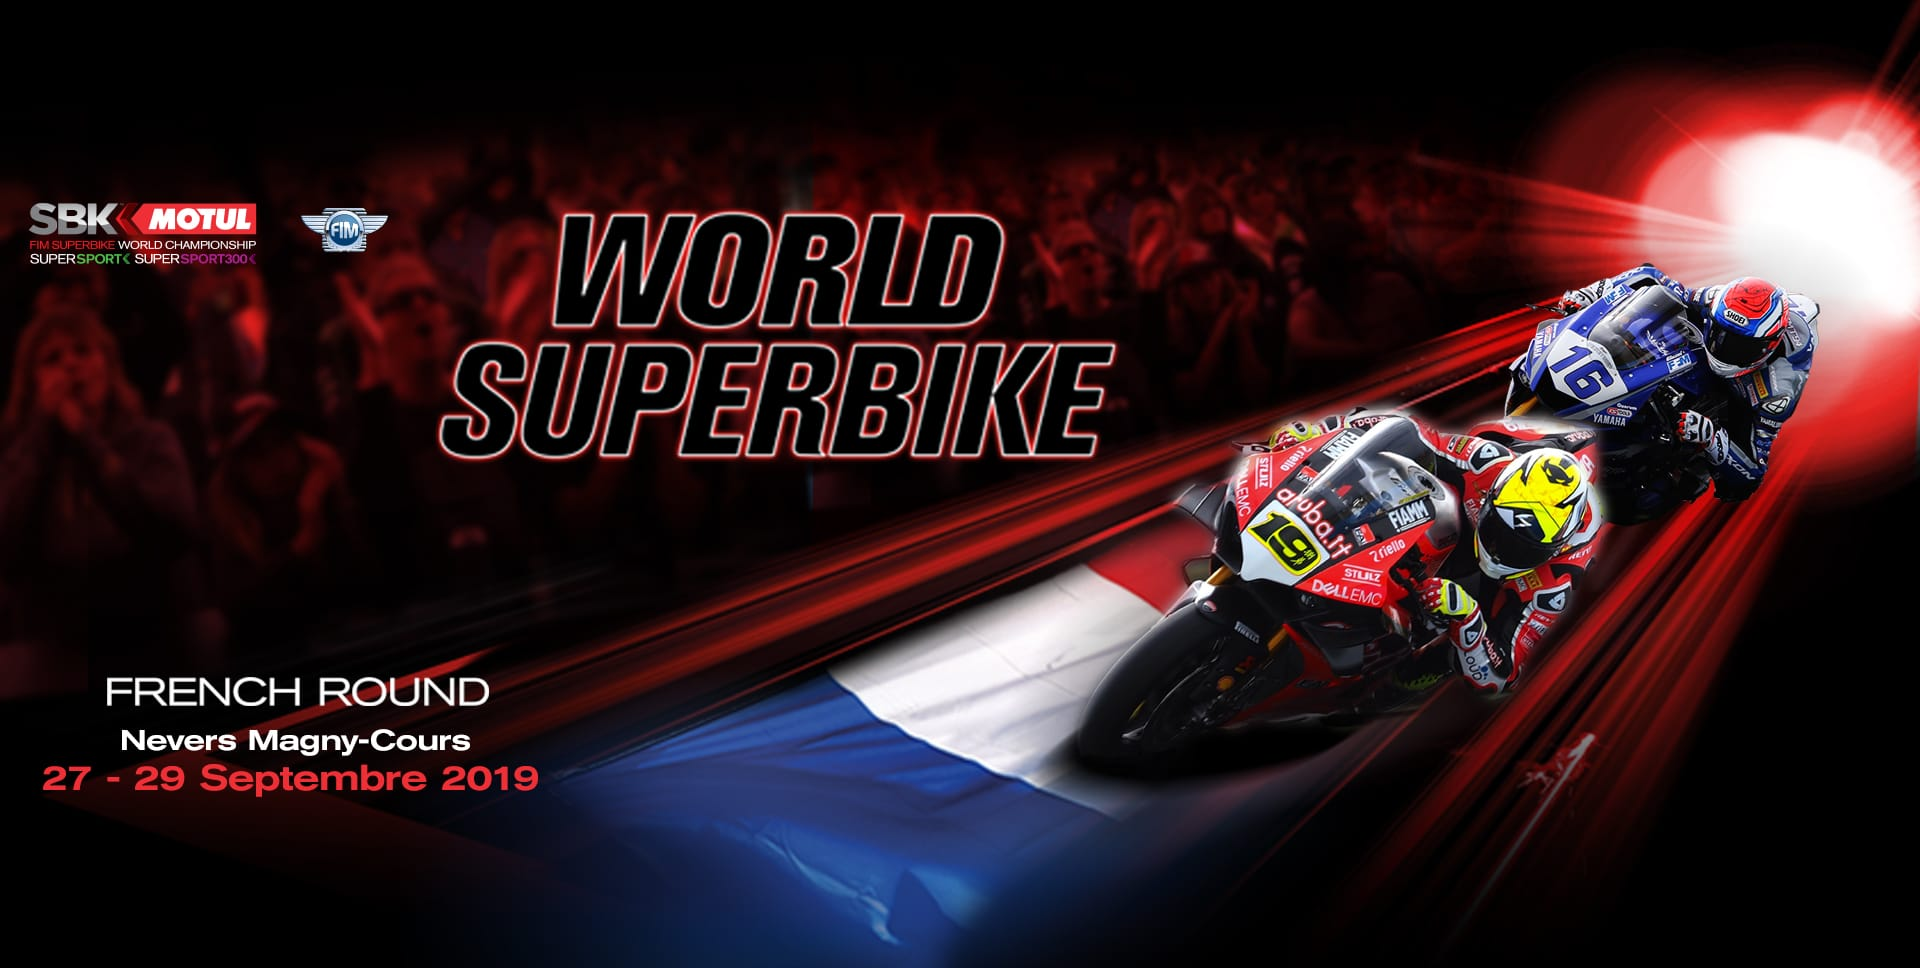 Calendrier Magny Cours 2020.Championnat Du Monde Worldsbk Superbike Magny Cours 3019